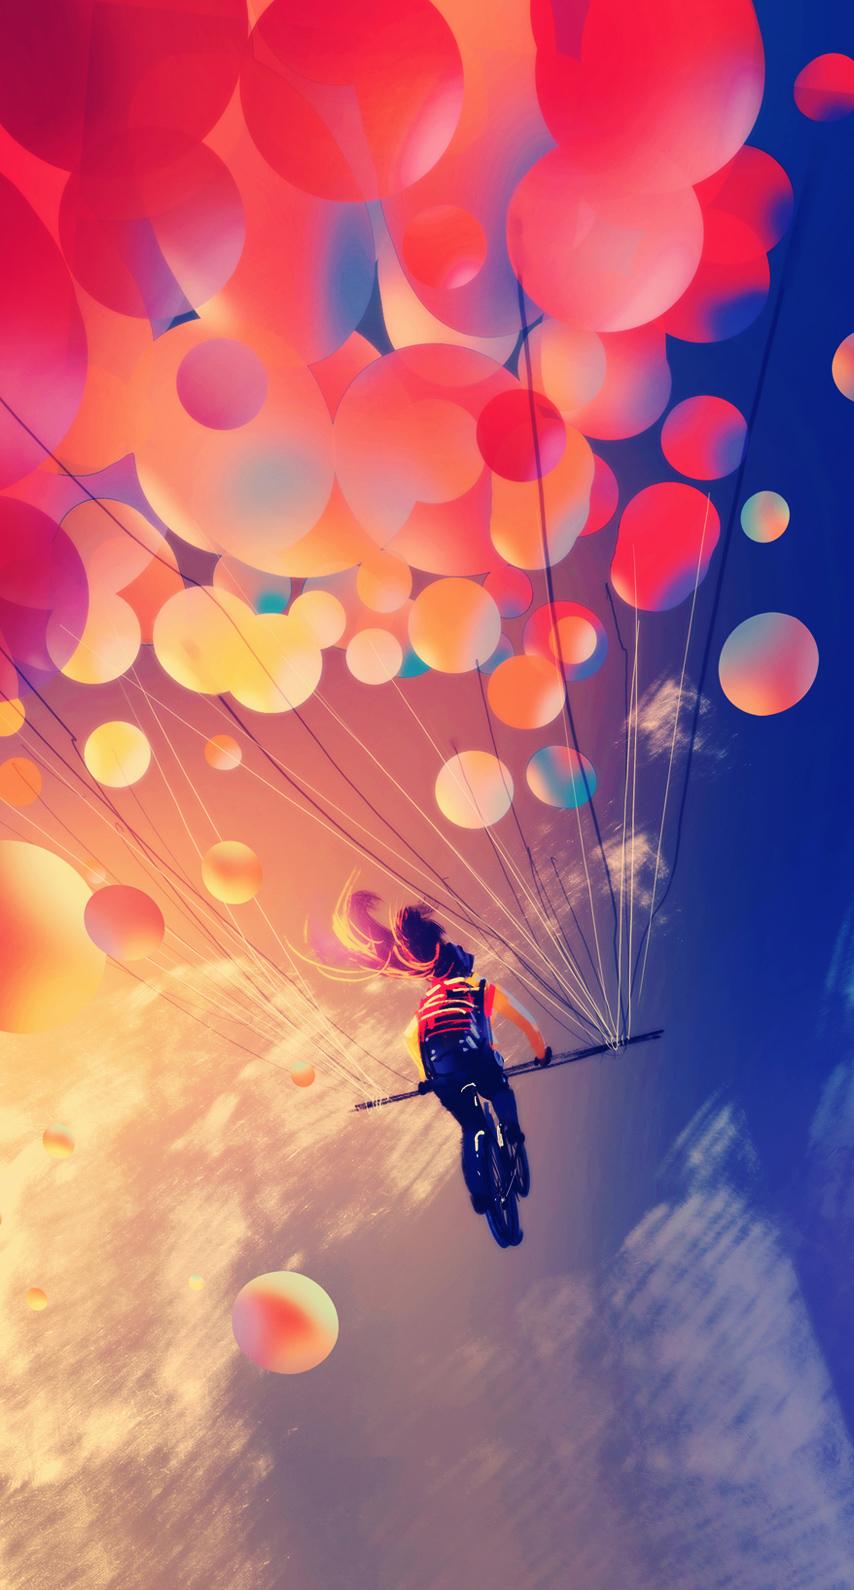 flying, recreation, action, sport, exhilaration, kite